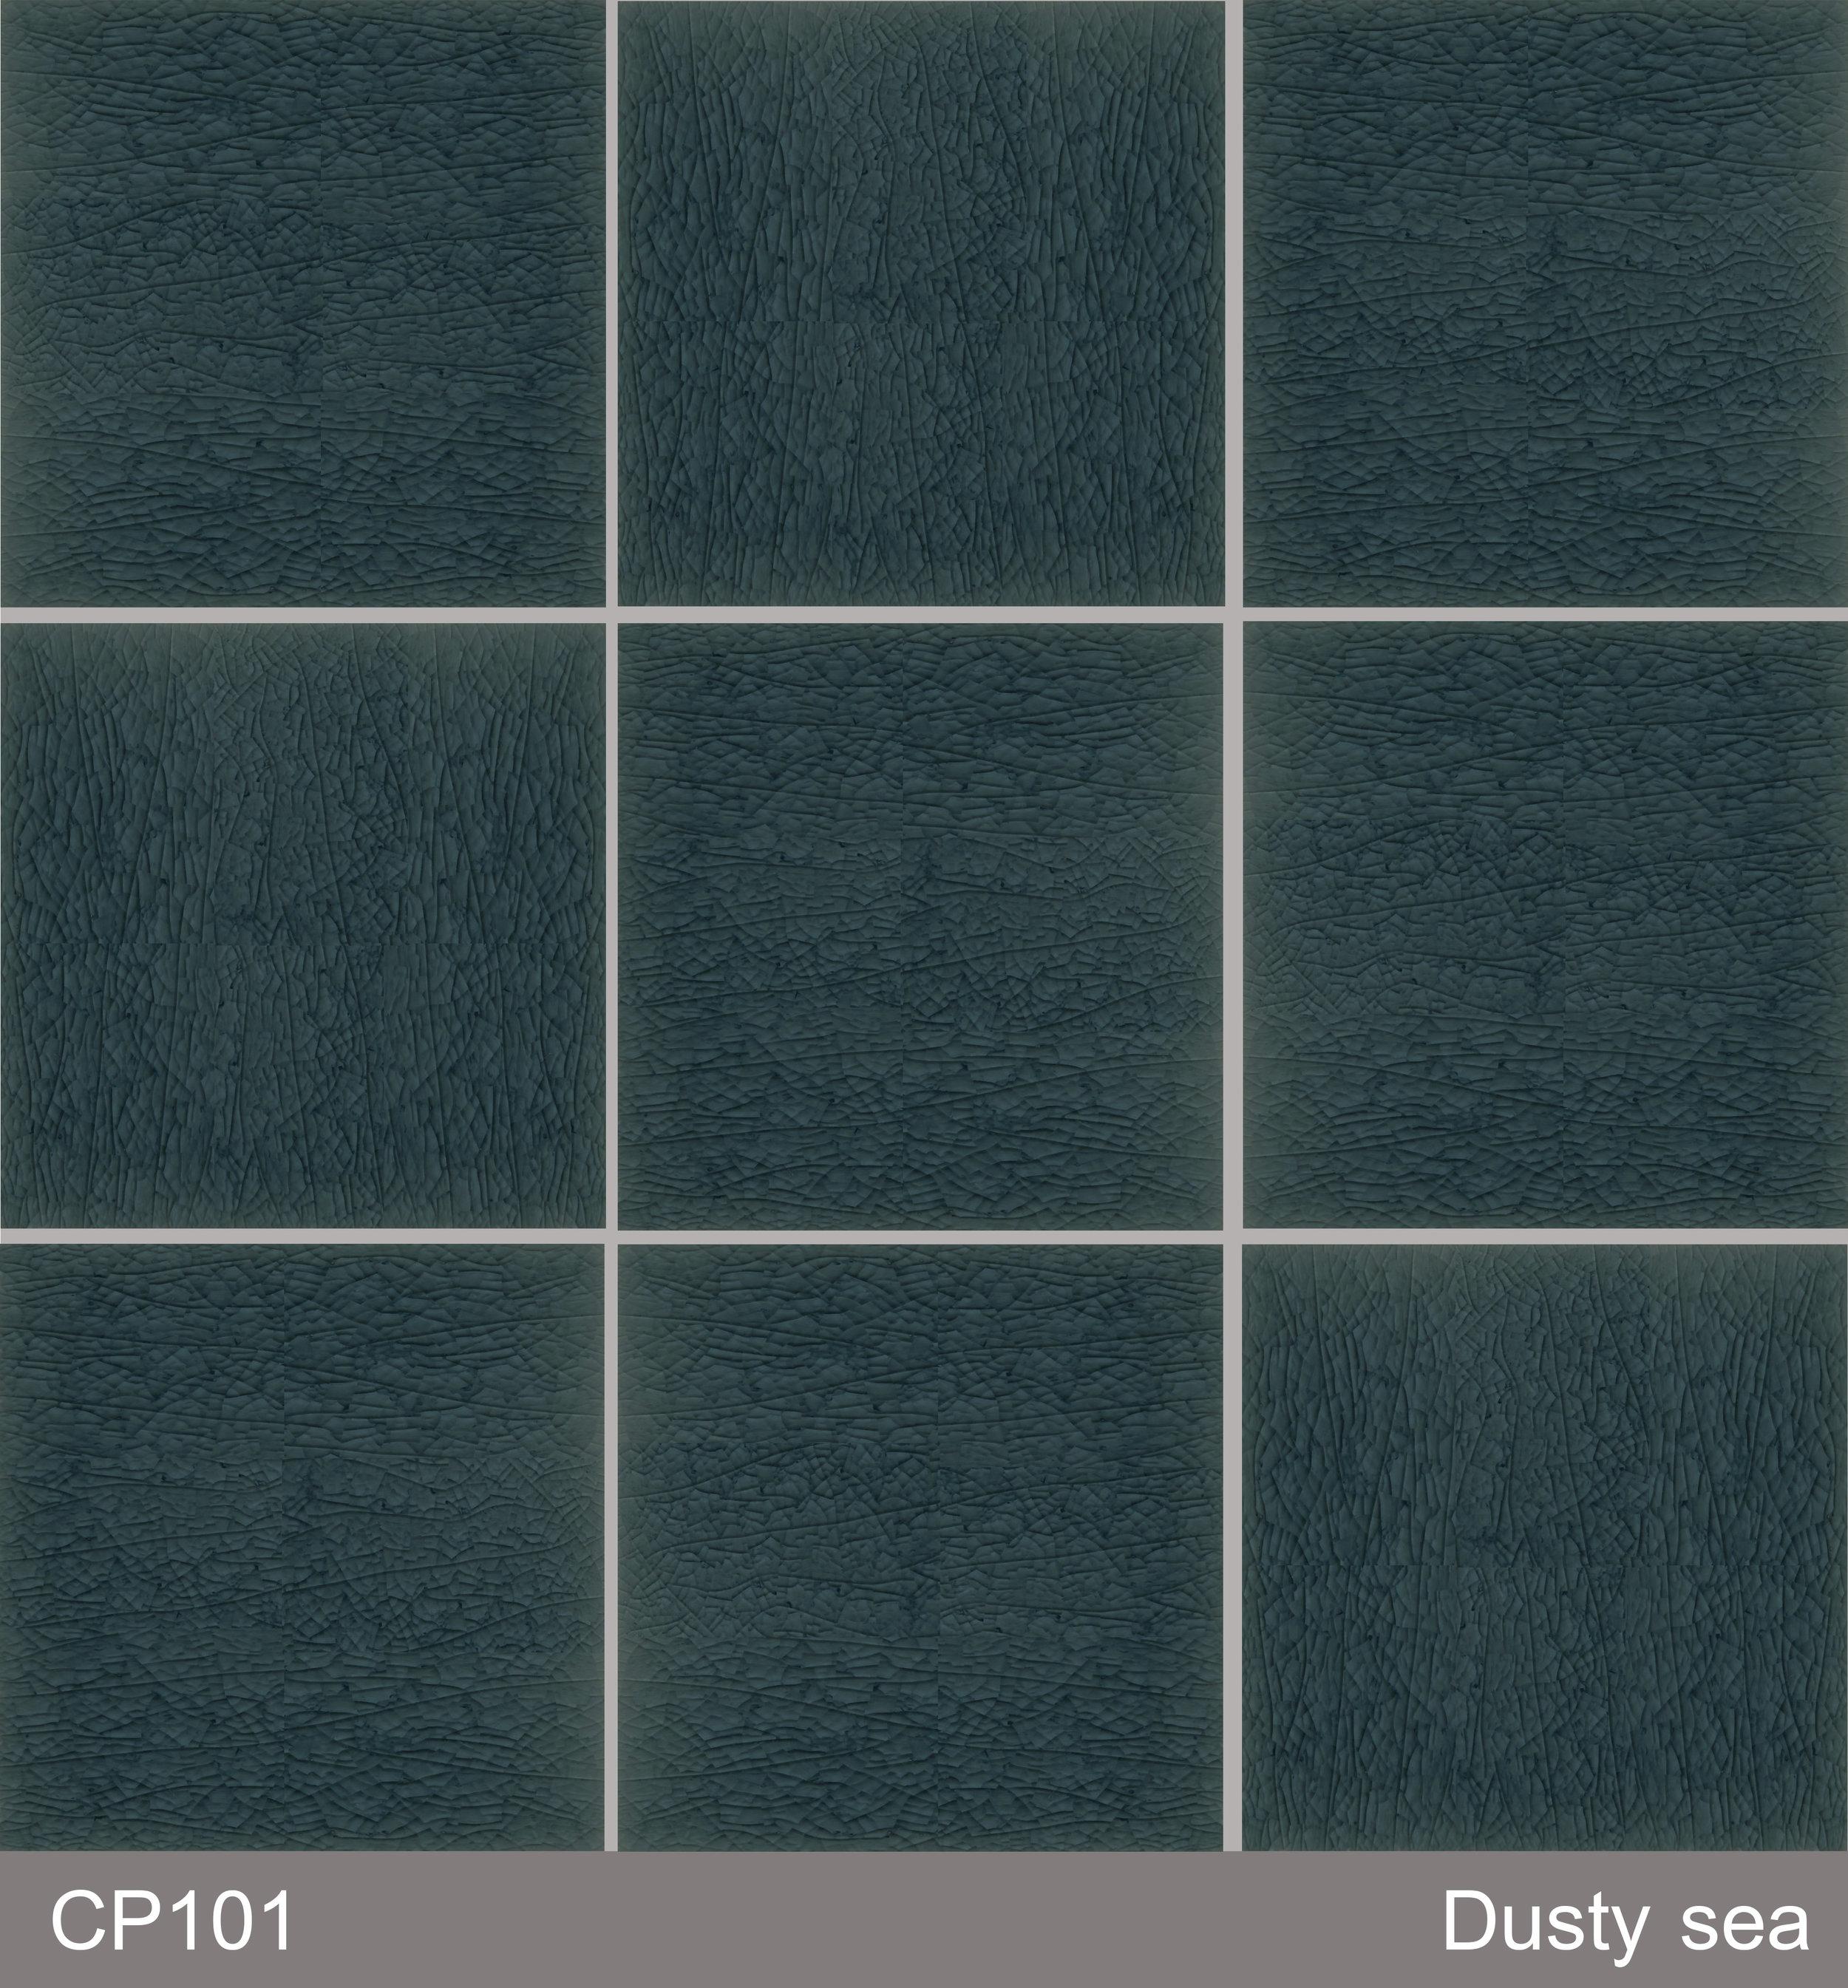 CP101 : Dusty sea